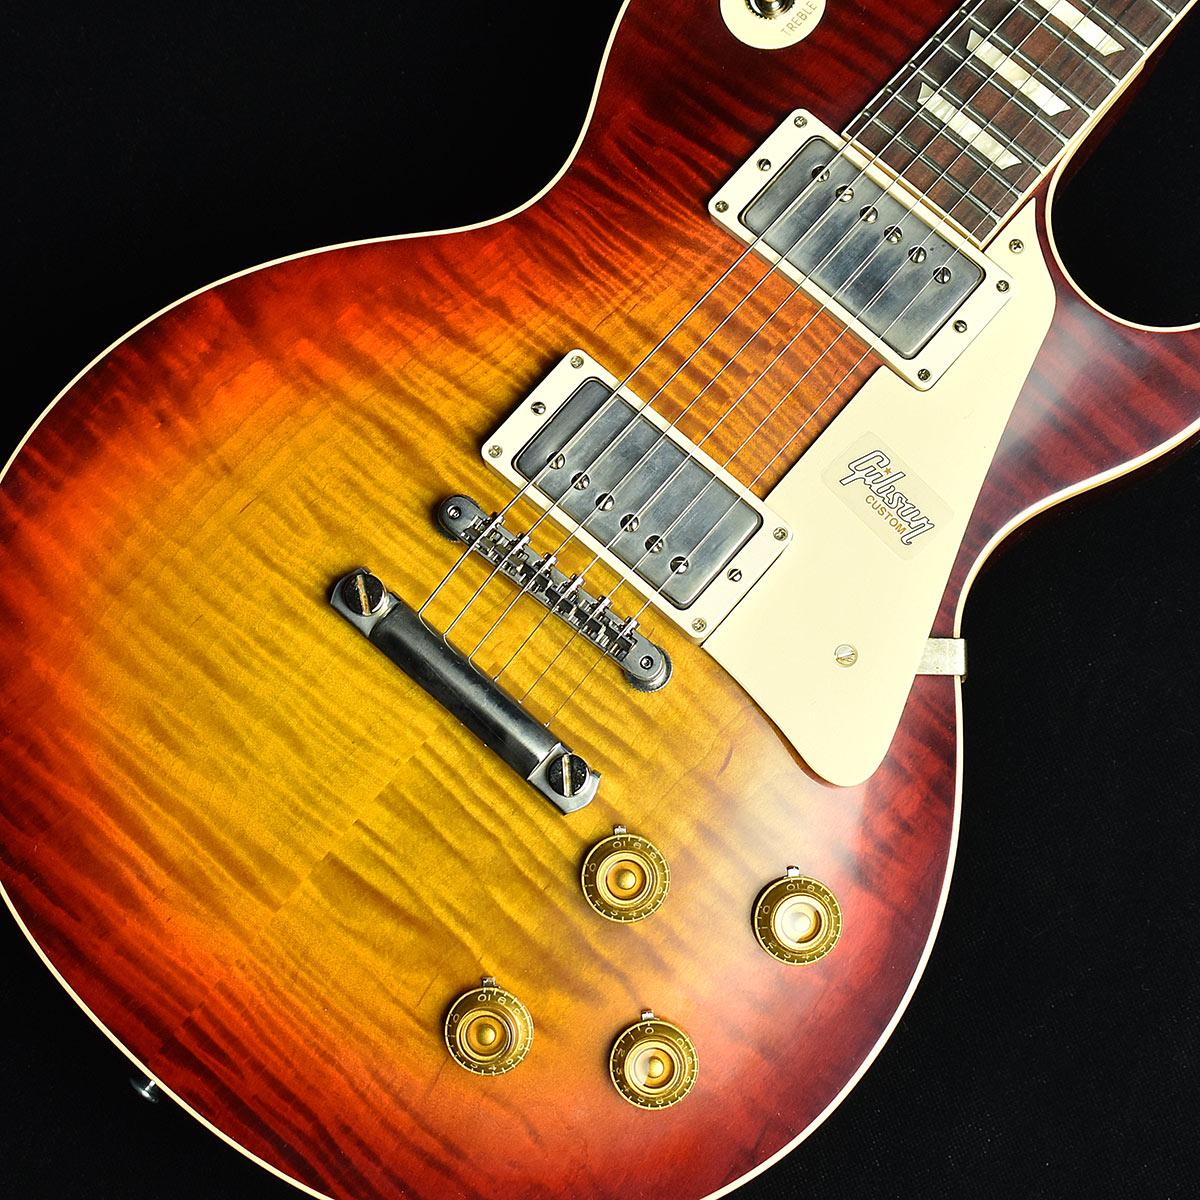 Gibson Custom Shop 60th 1959 Les Paul Standard VOS Factory Burst S/N:993921 【ギブソン カスタムショップ】【60th Anniversary】【現地選定材オーダー品】【未展示品】